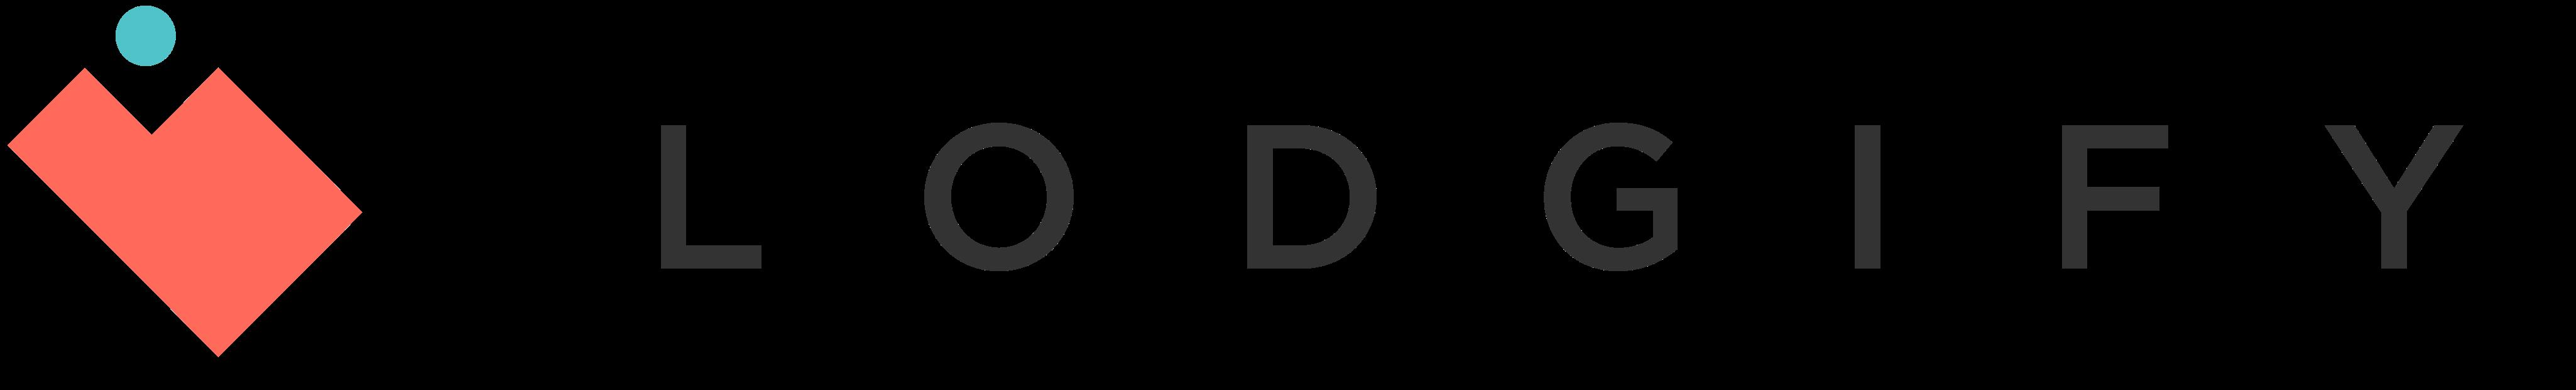 Lodgify_Logo-1.png